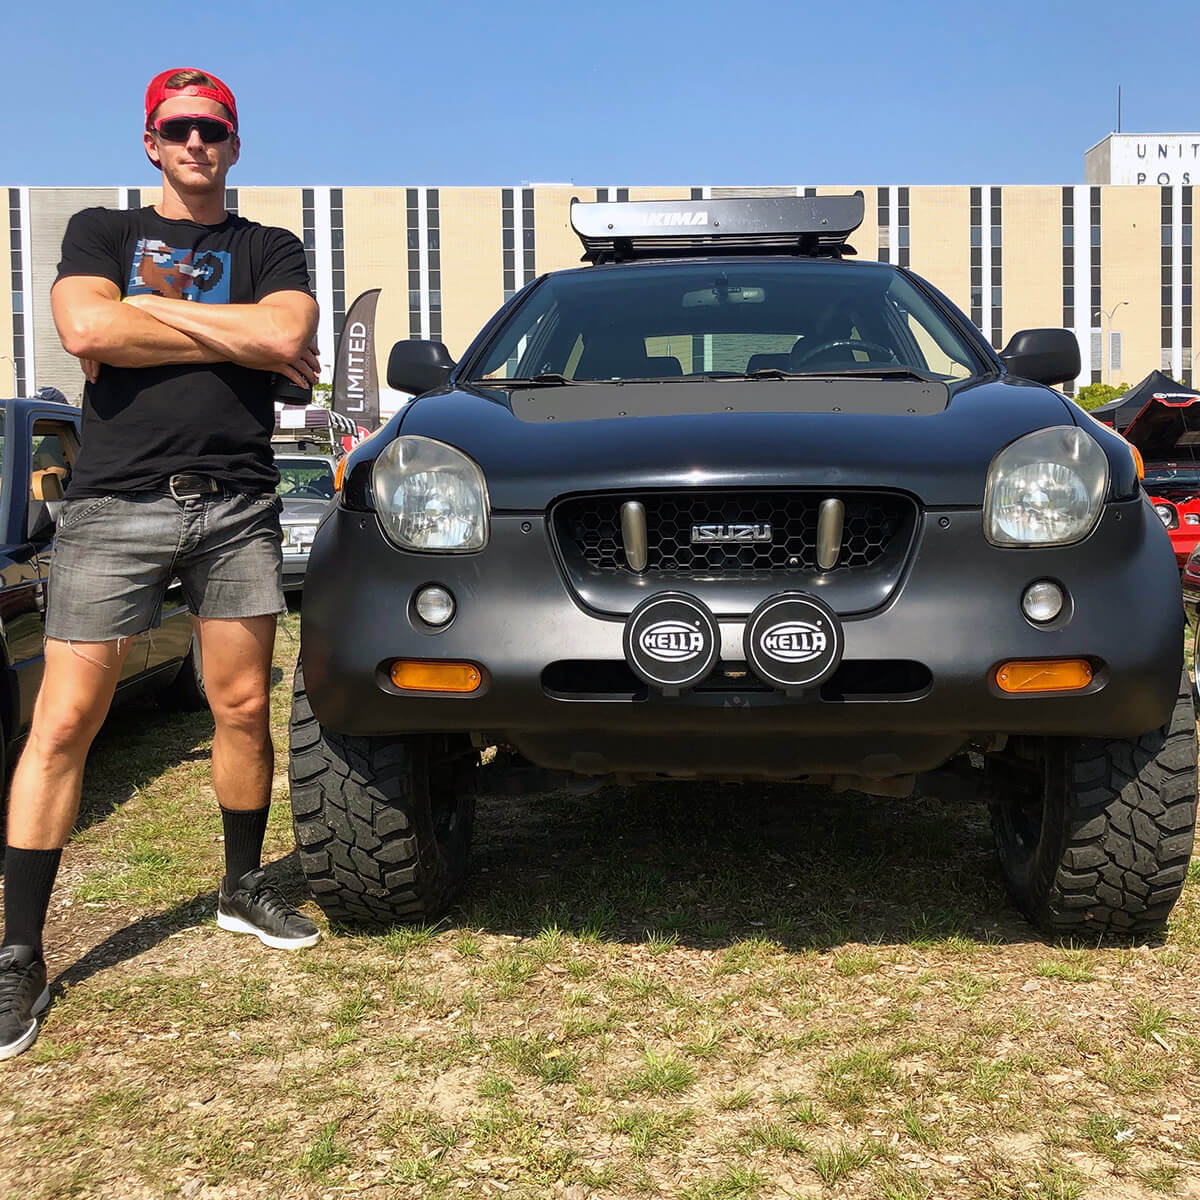 isuzu vehicross Hella off-road driving lights